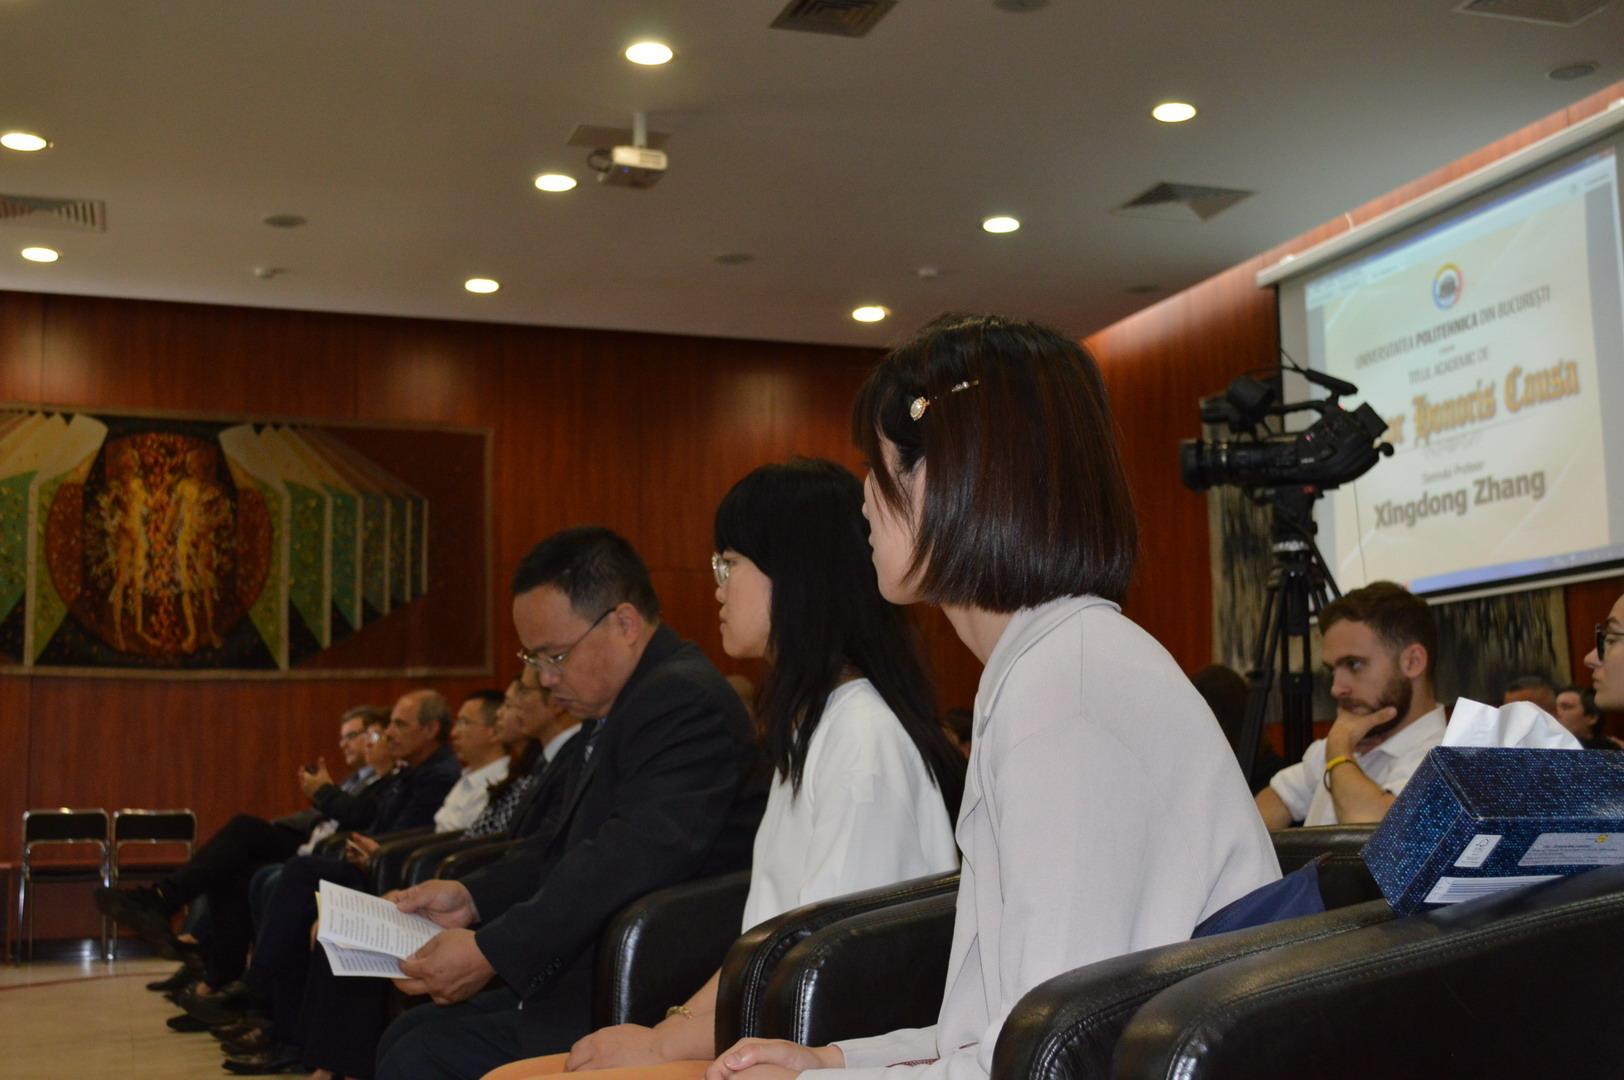 UPB va acorda astăzi Titlul Academic de Doctor Honoris Causa dlui Profesor Xingdong Zhang1